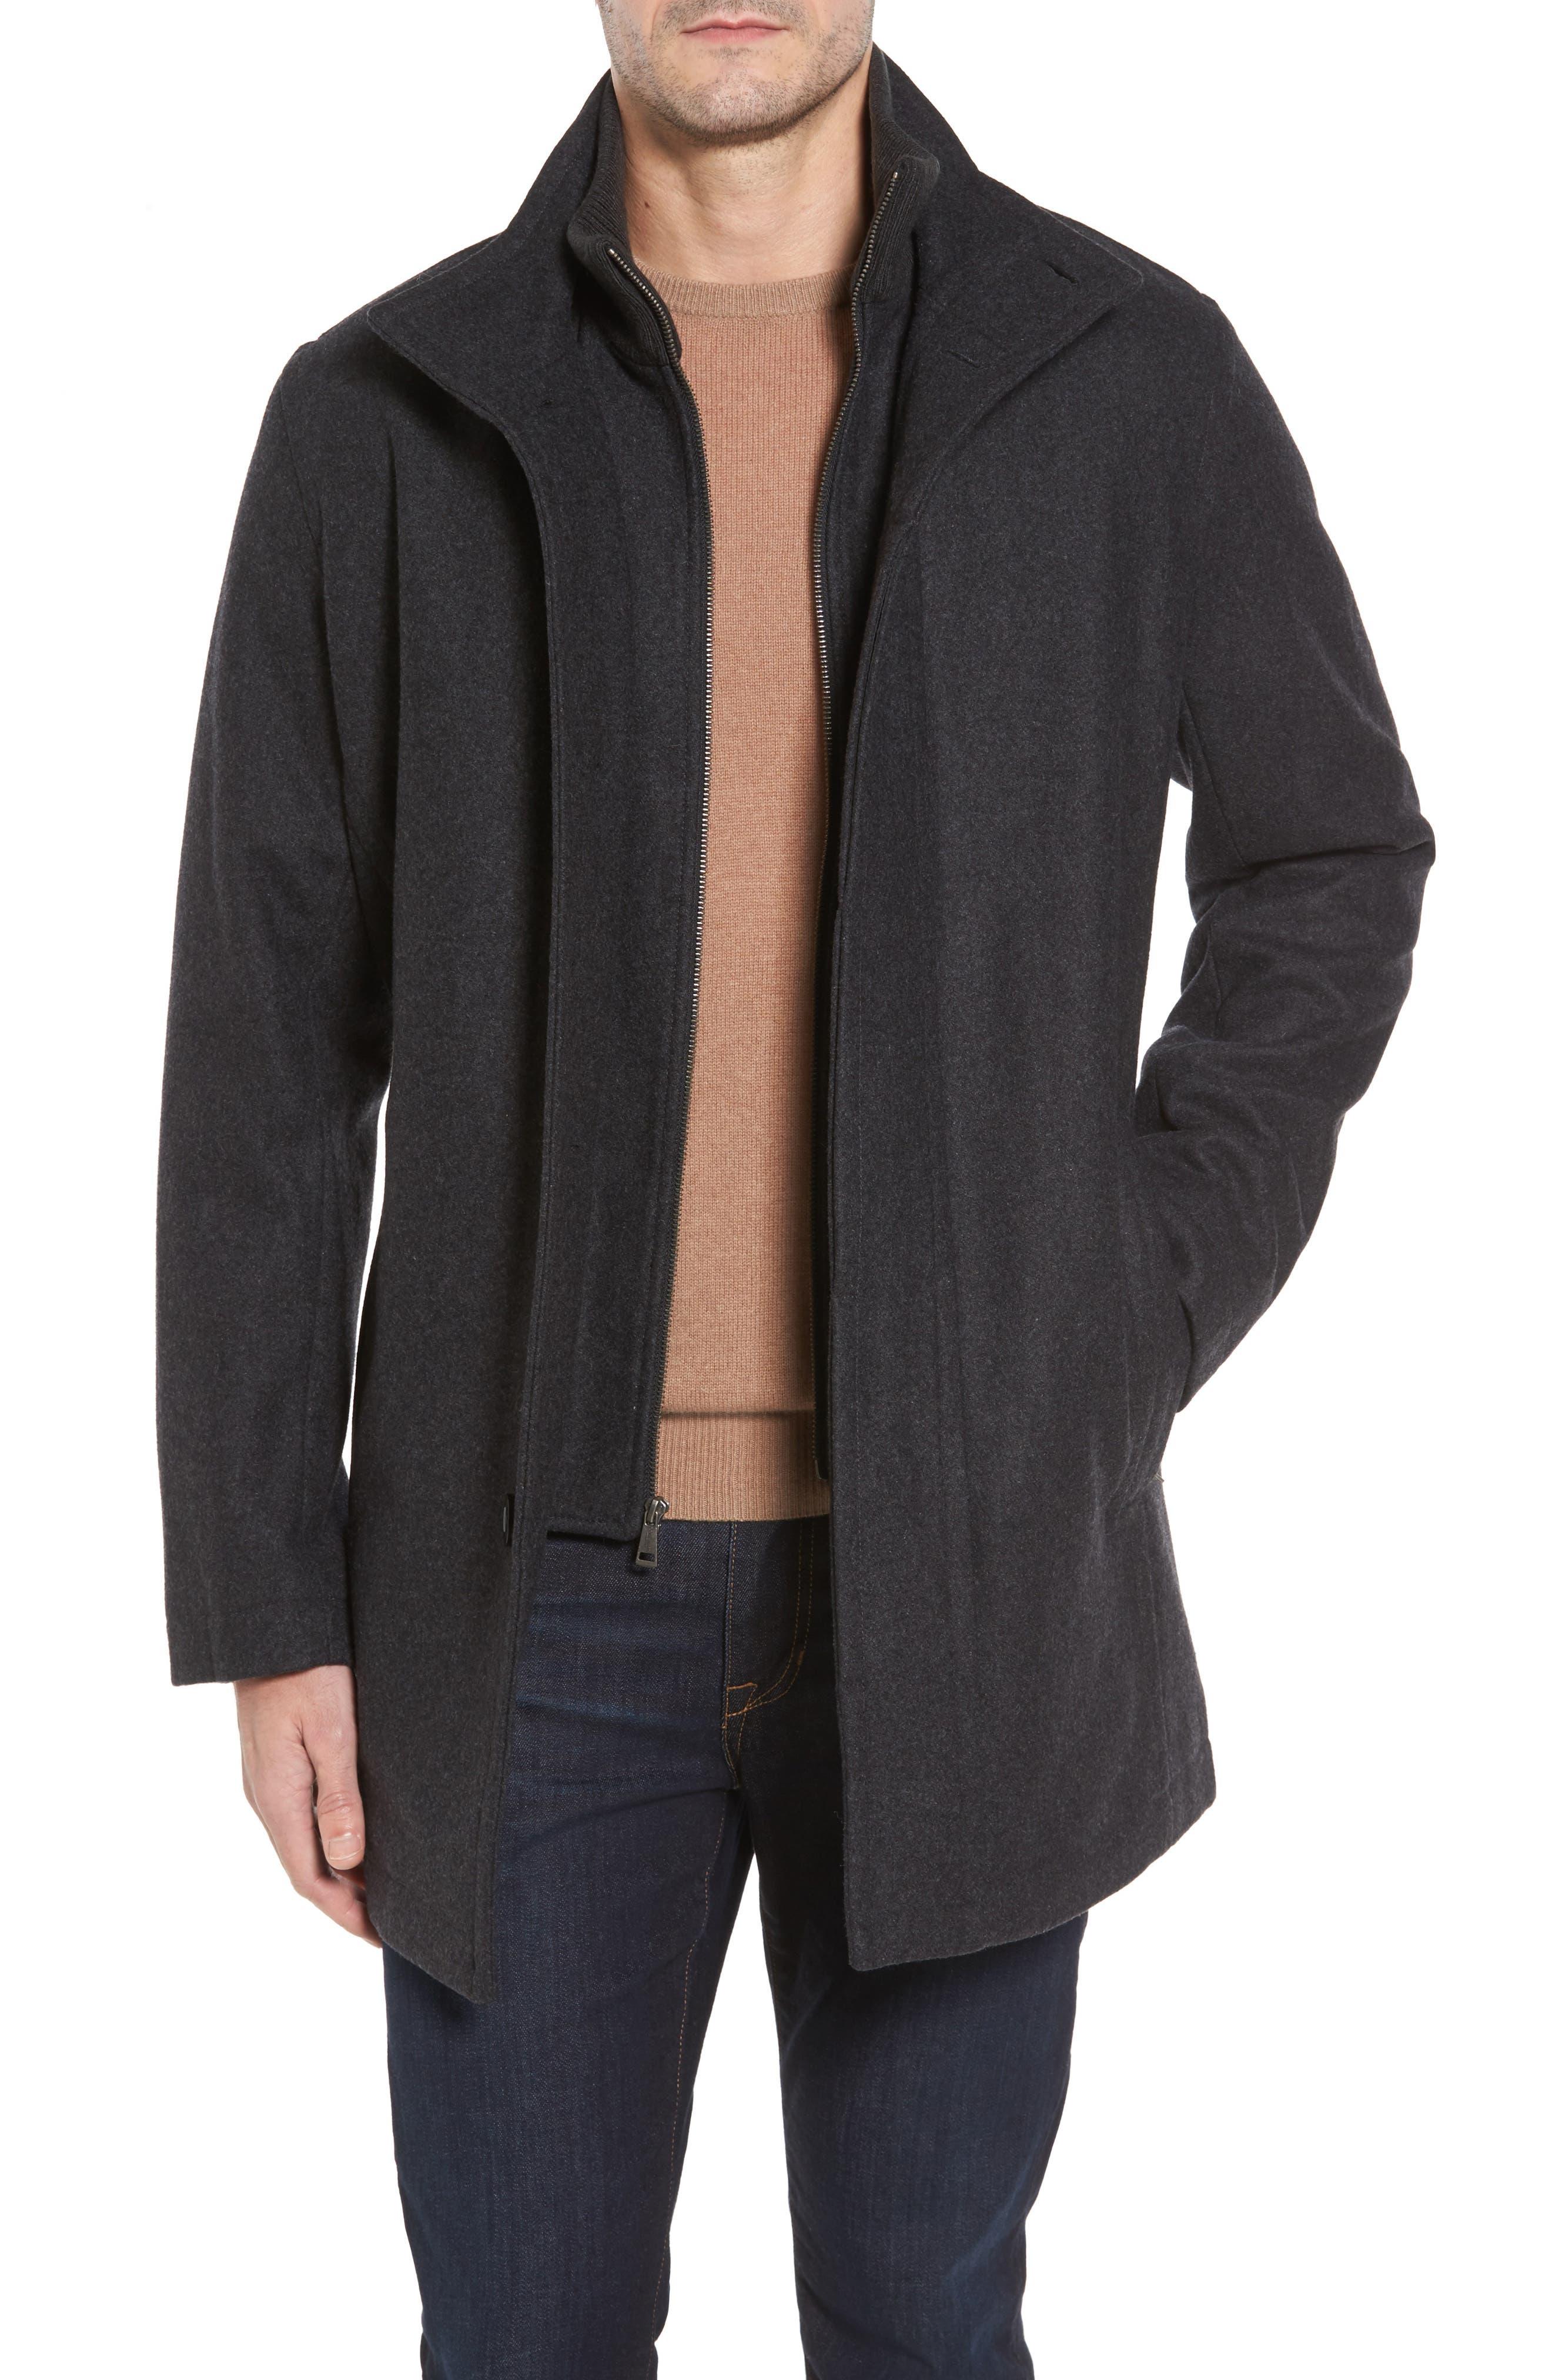 Main Image - Cole Haan Melton Wool Blend Coat